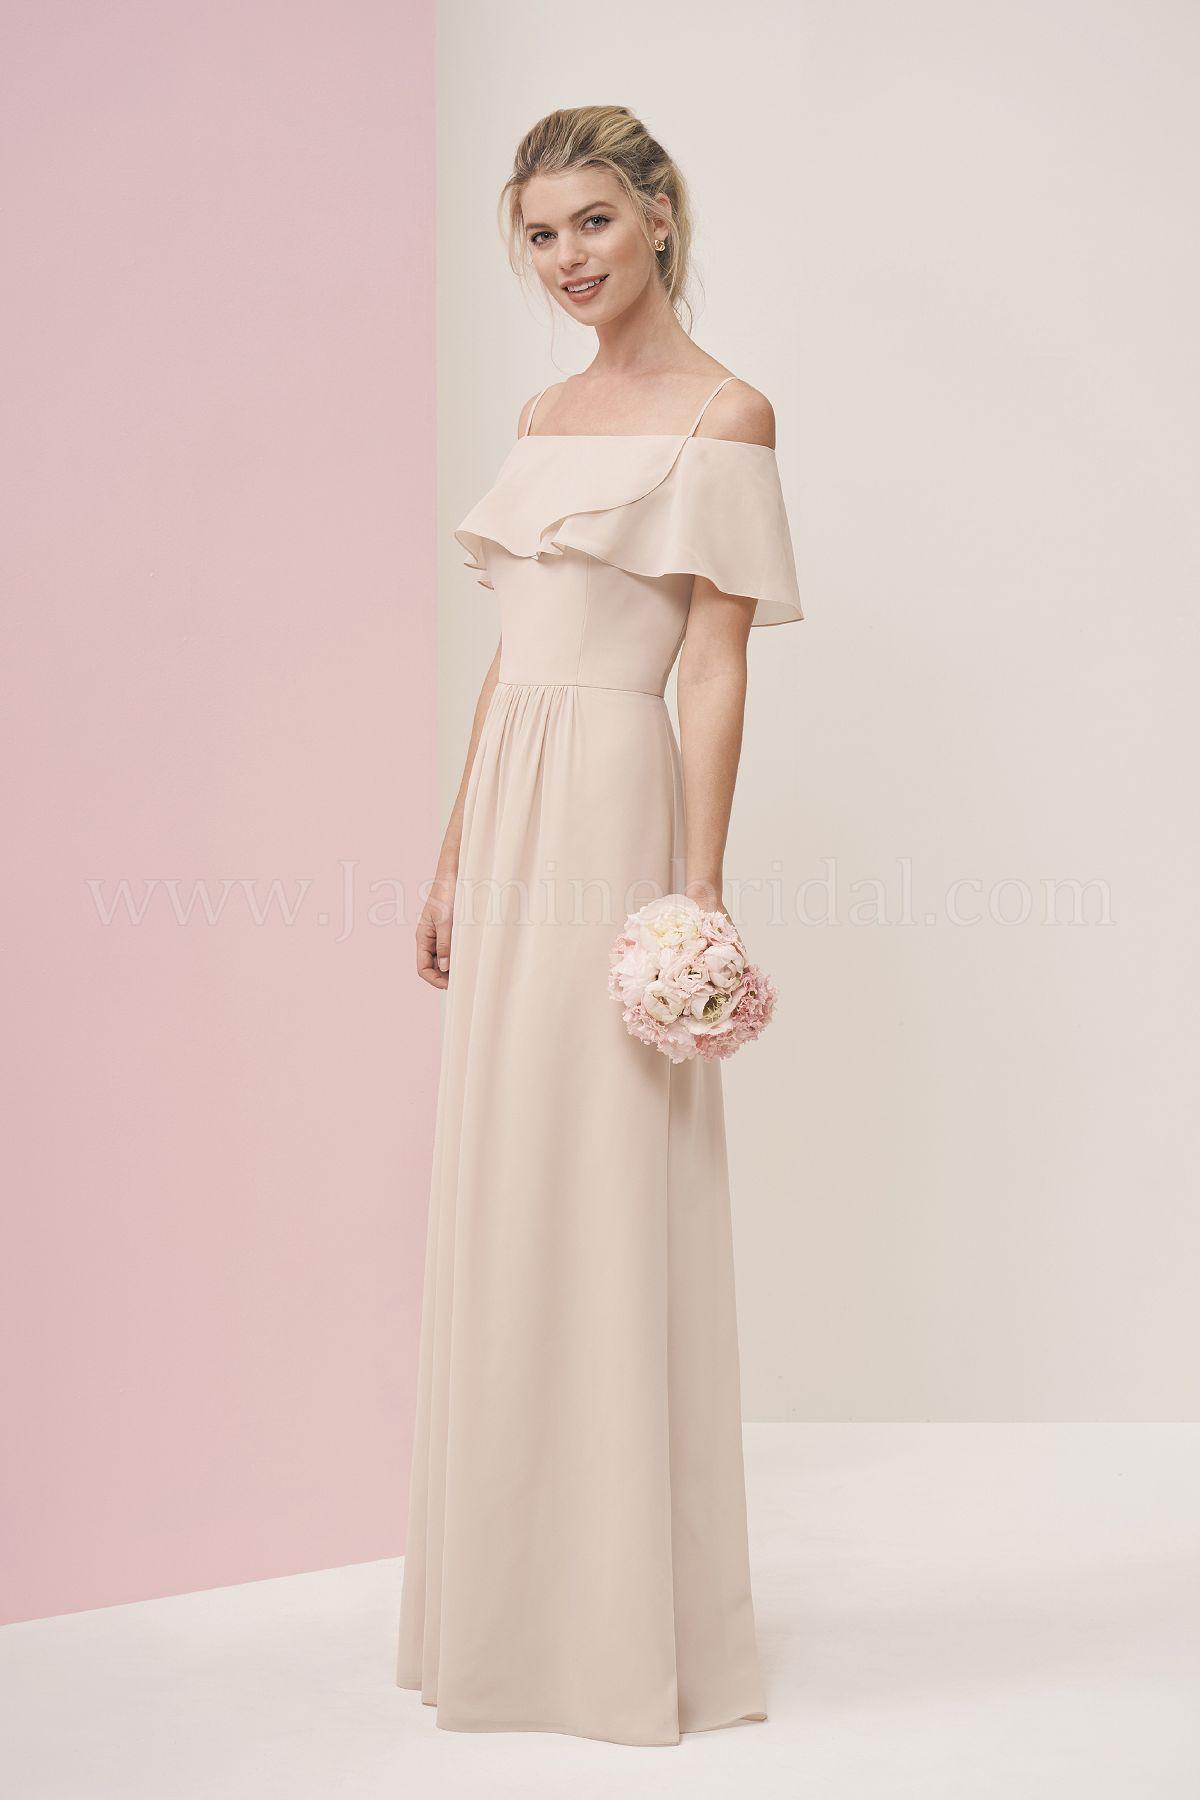 Jasmine Bridal Modest Wedding Dresses White Bridesmaid Dresses Jasmine Bridesmaids Dresses [ 1800 x 1200 Pixel ]